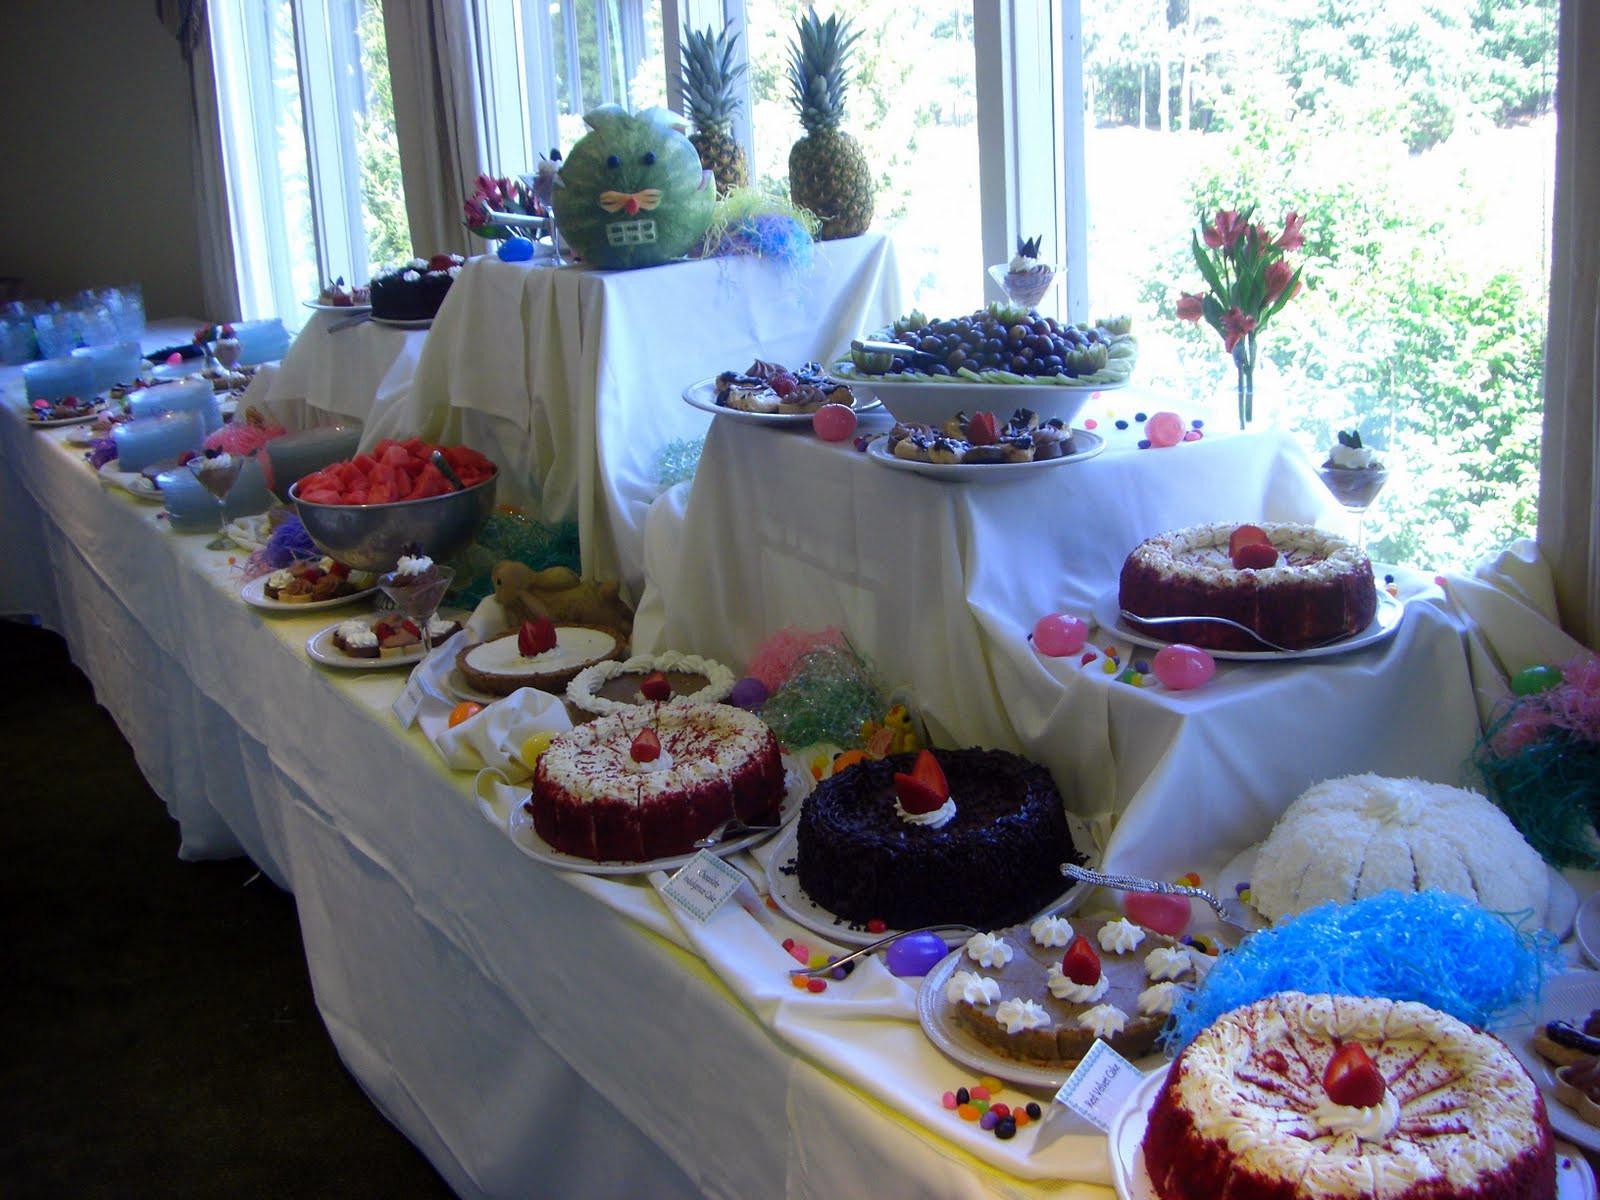 Easter Brunch Desserts  Jeff s Daily Picture Easter Brunch Dessert Table